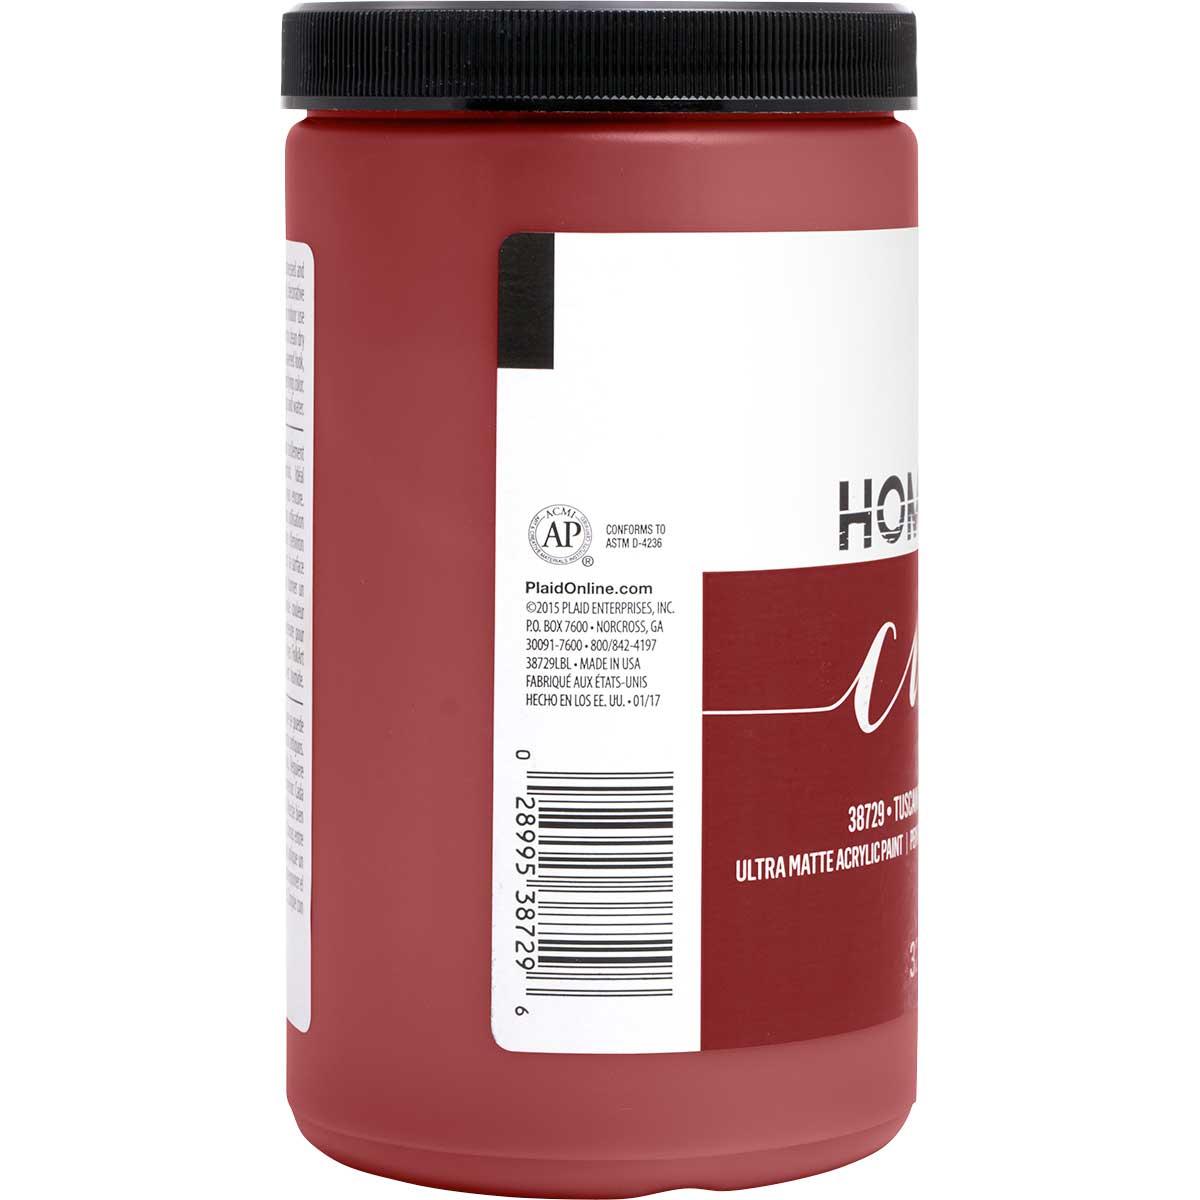 FolkArt ® Home Decor™ Chalk - Tuscan Red, 32 oz. - 38729